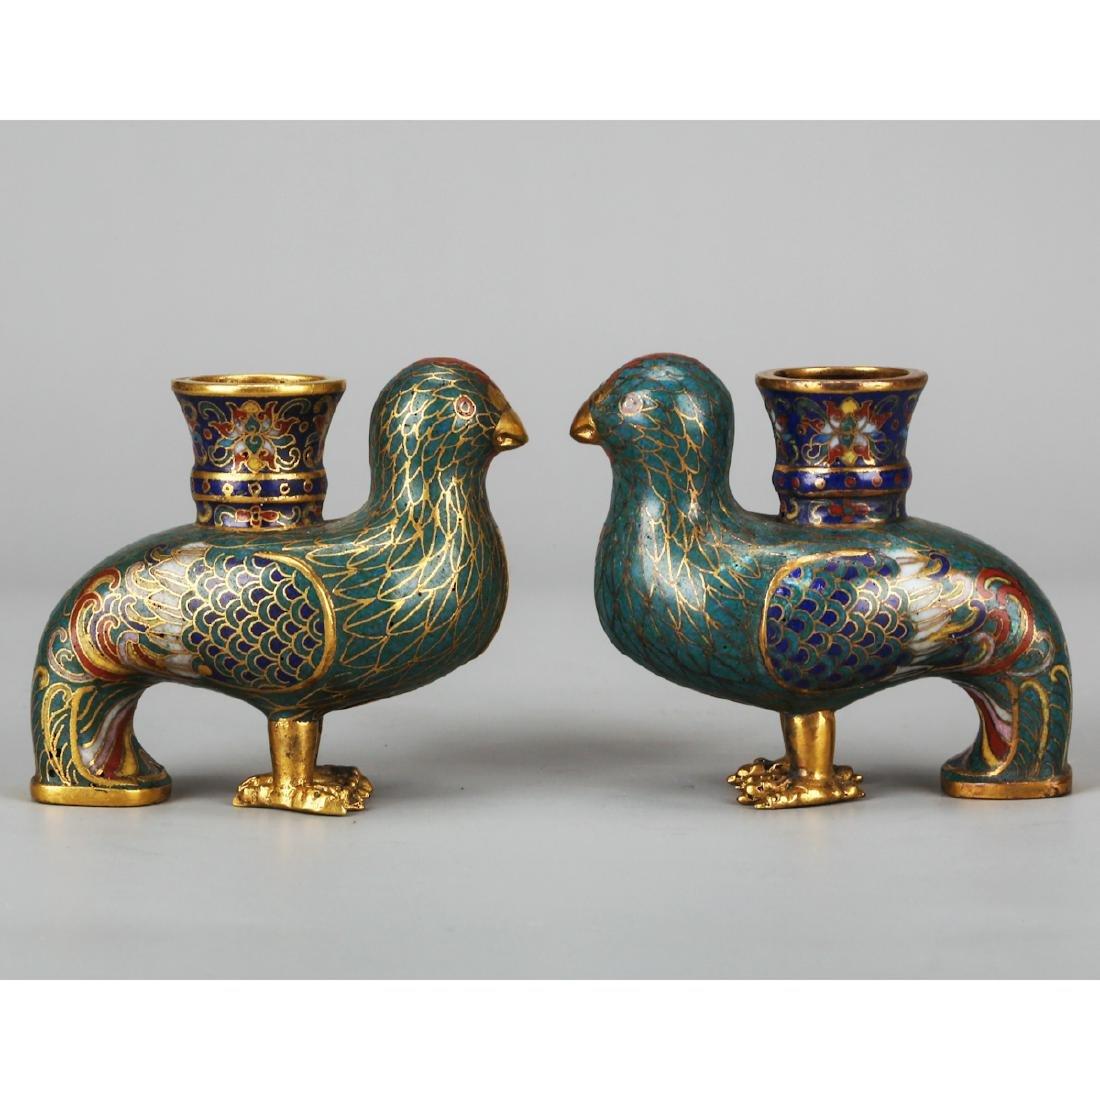 CHINESE CLOISONNE BIRD VASES, PAIR